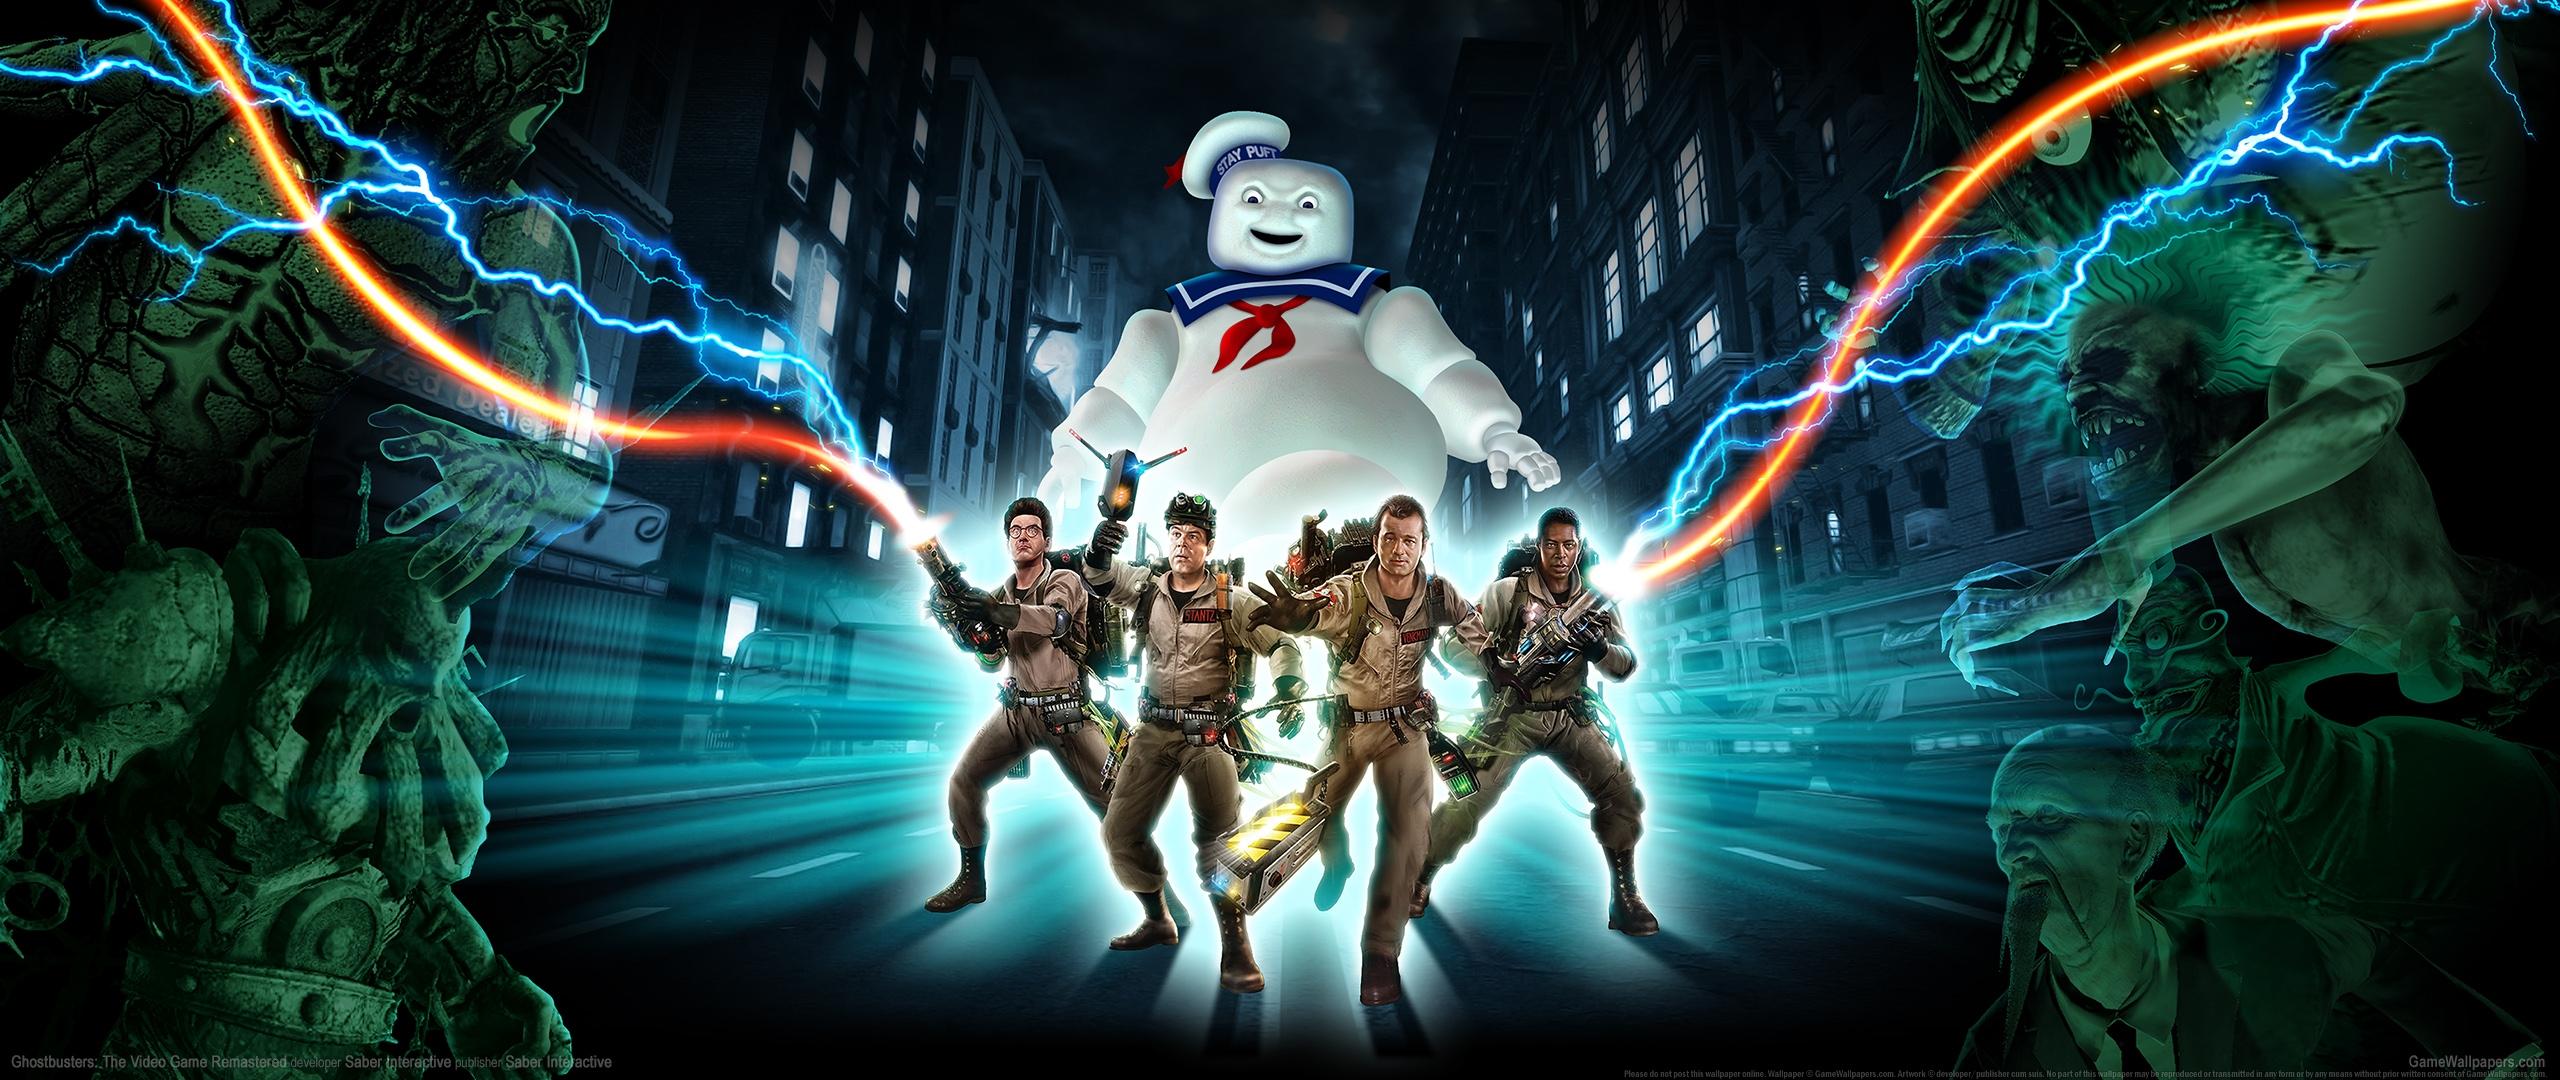 Ghostbusters: The Video Game Remastered 2560x1080 Hintergrundbild 01